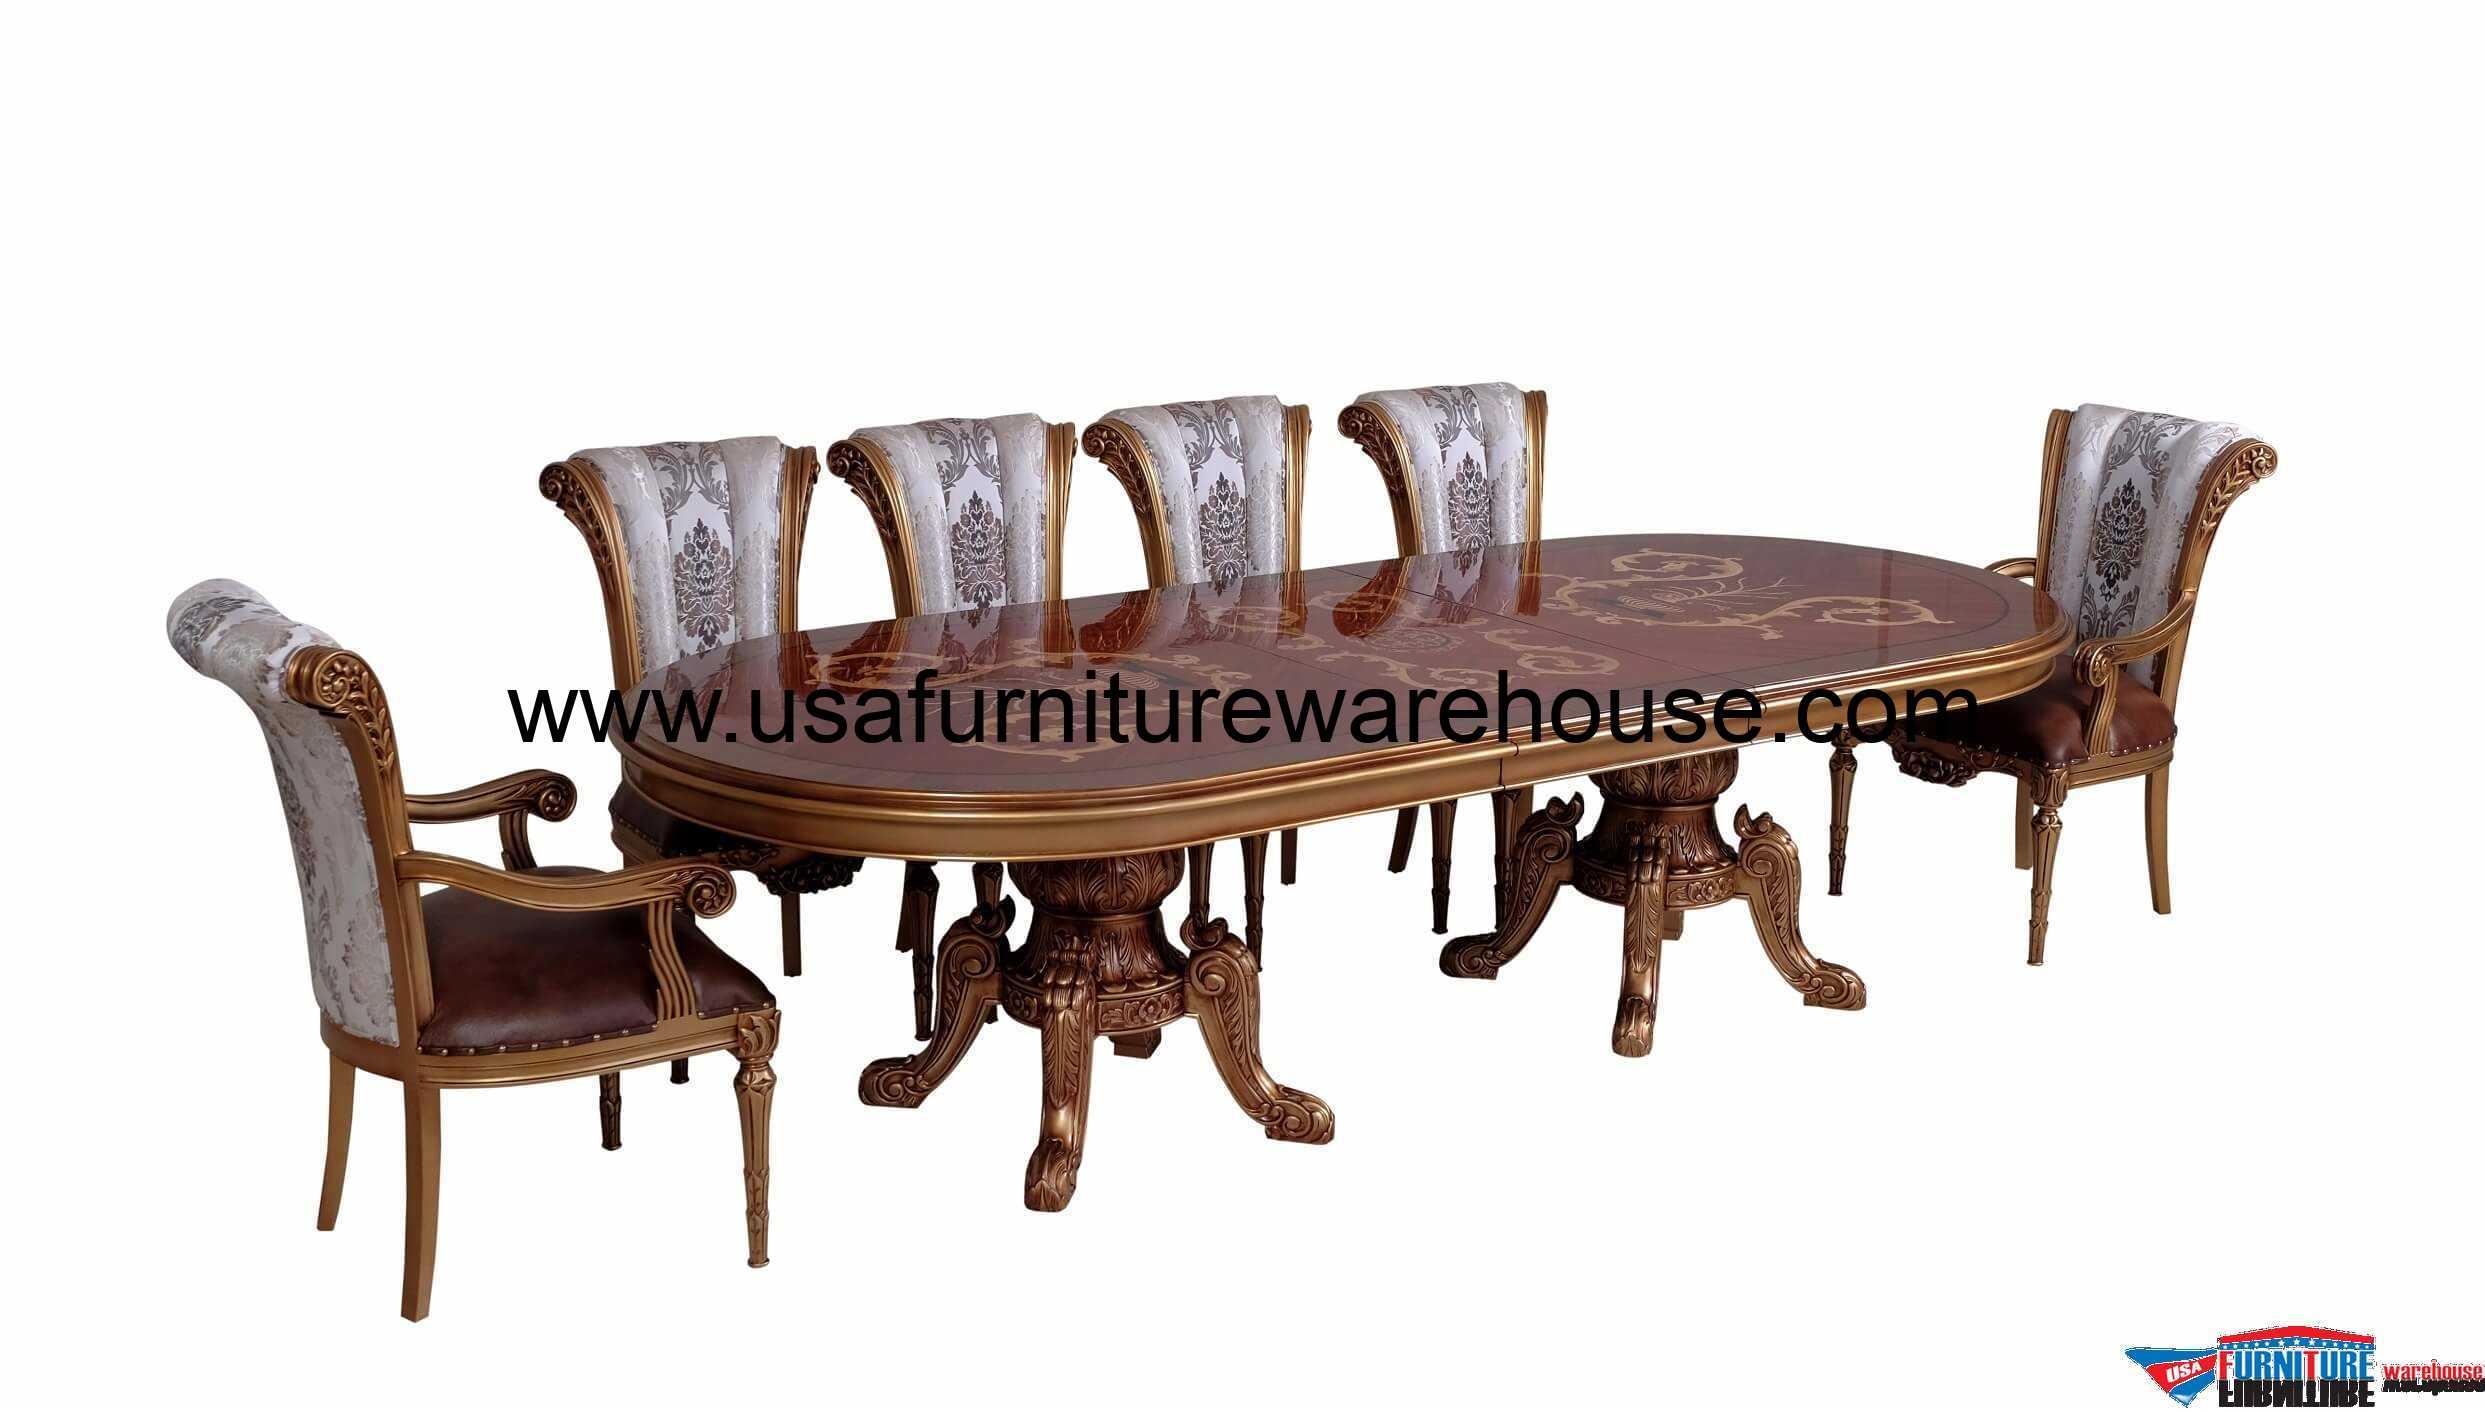 USA Furniture Warehouse